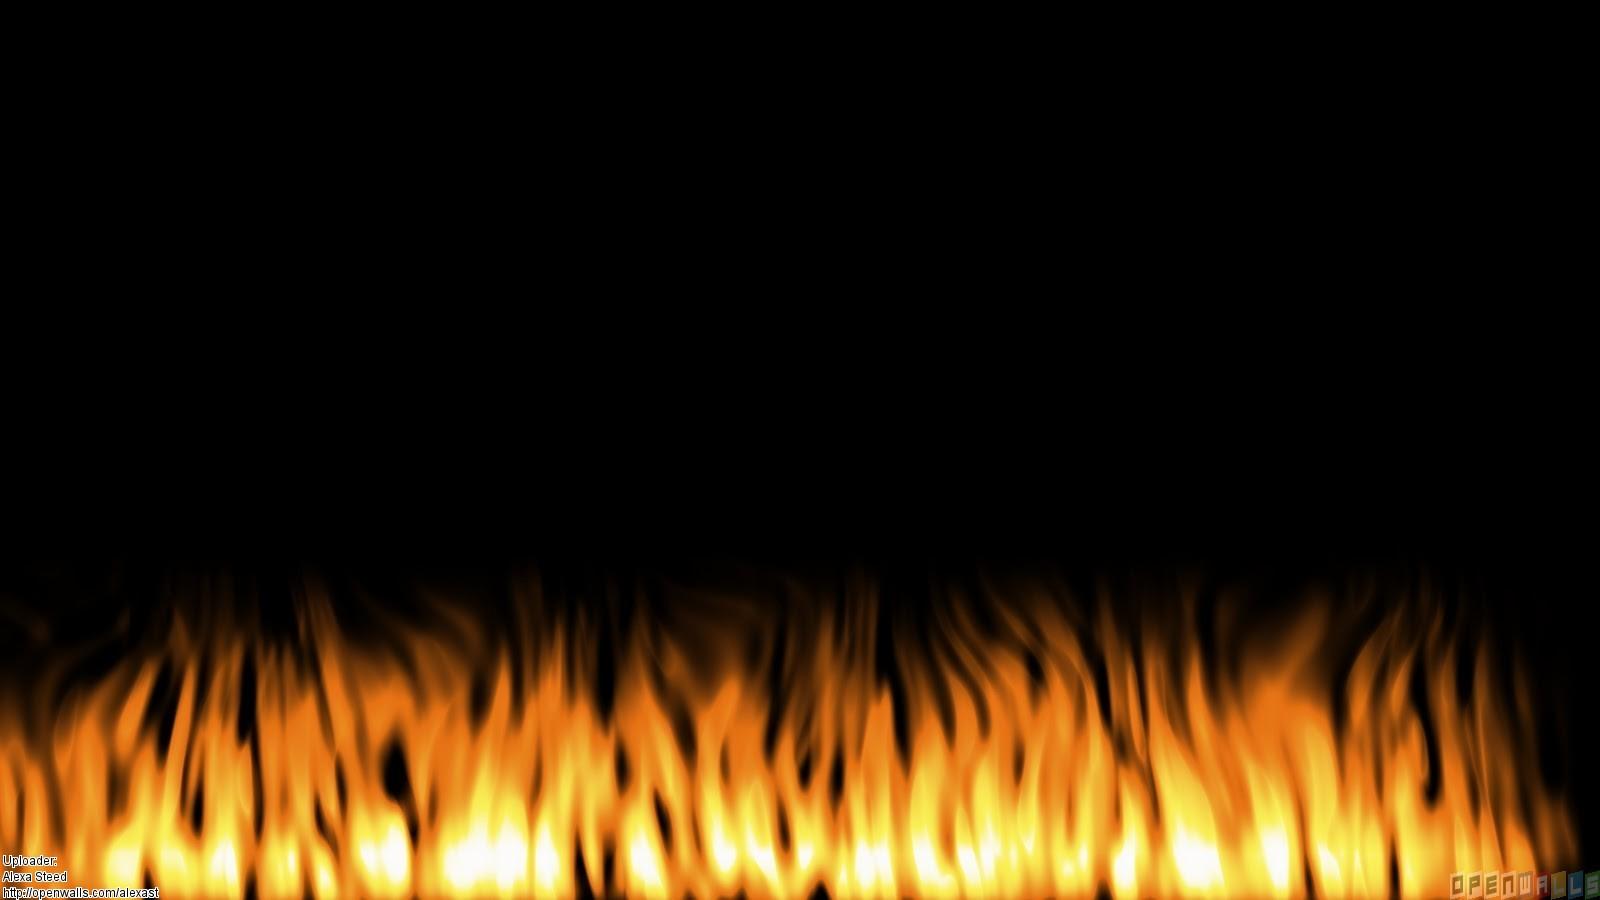 Free Download Flames On The Black Background Wallpaper 6830 Open Walls 1600x900 For Your Desktop Mobile Tablet Explore 72 Flame Wallpaper Calgary Flames Wallpaper Calgary Flames Iphone Wallpaper Calgary Flames Desktop Wallpaper